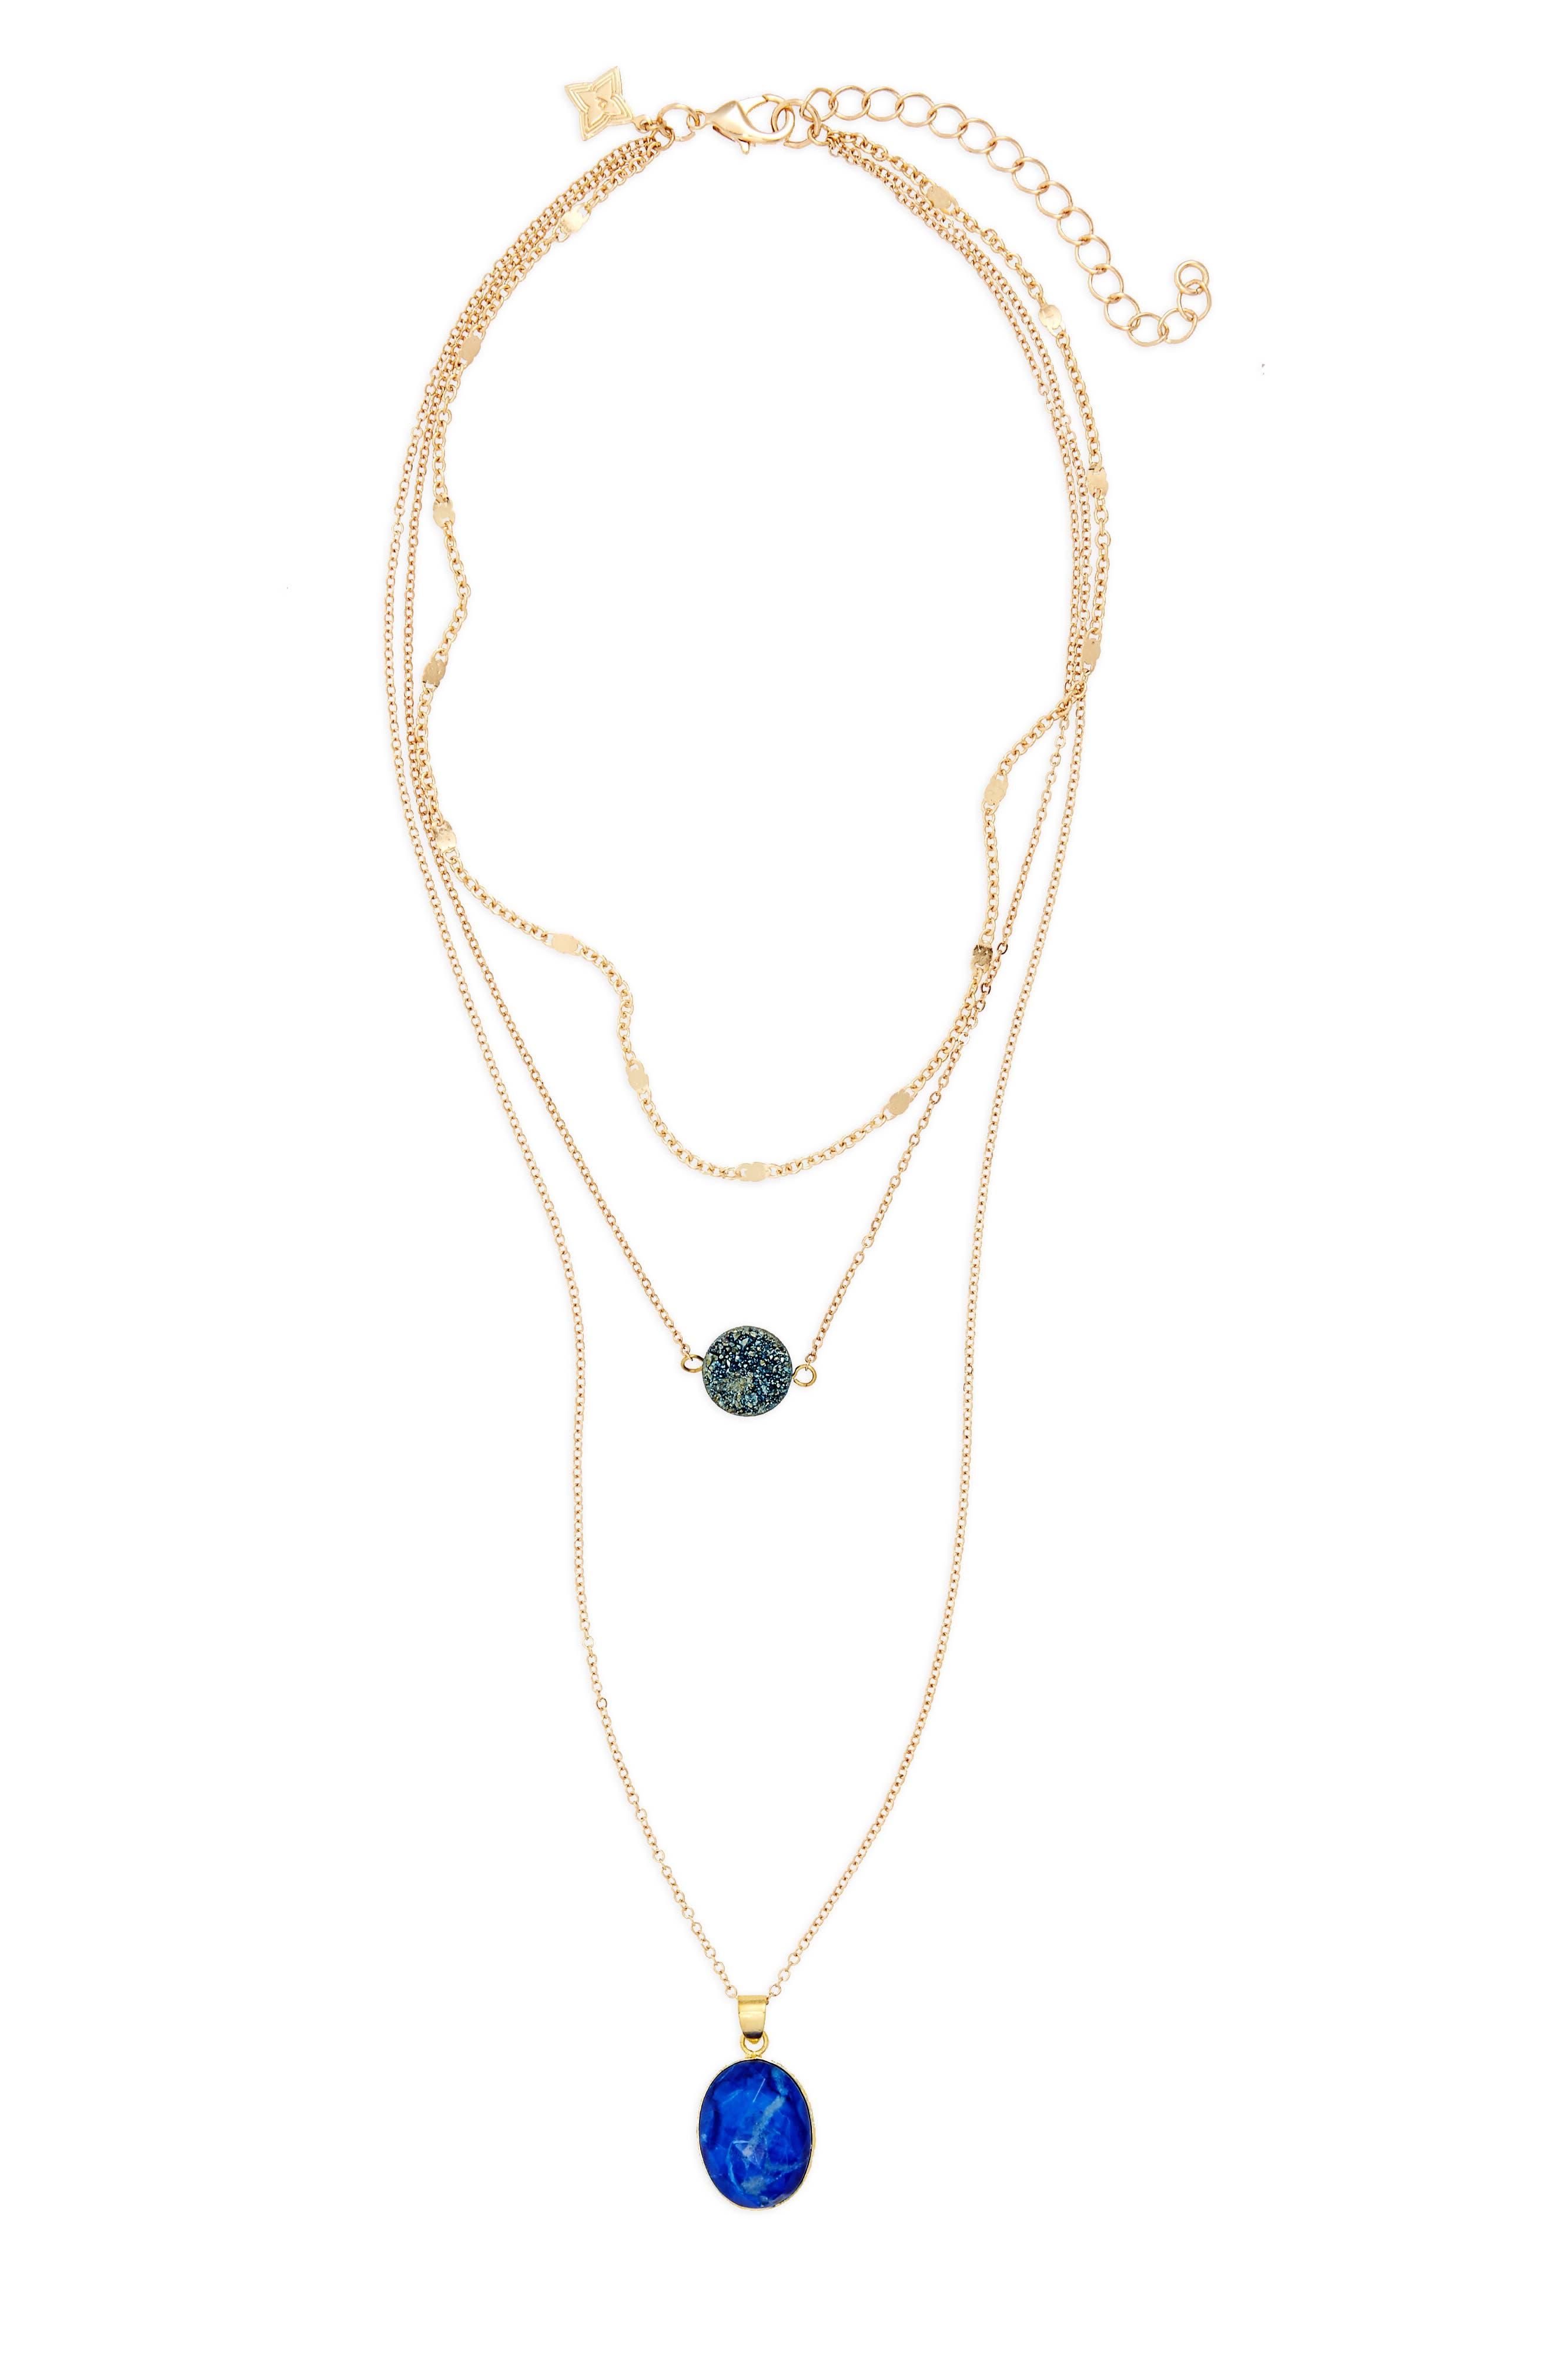 Multistrand Pendant Necklace,                             Main thumbnail 1, color,                             410